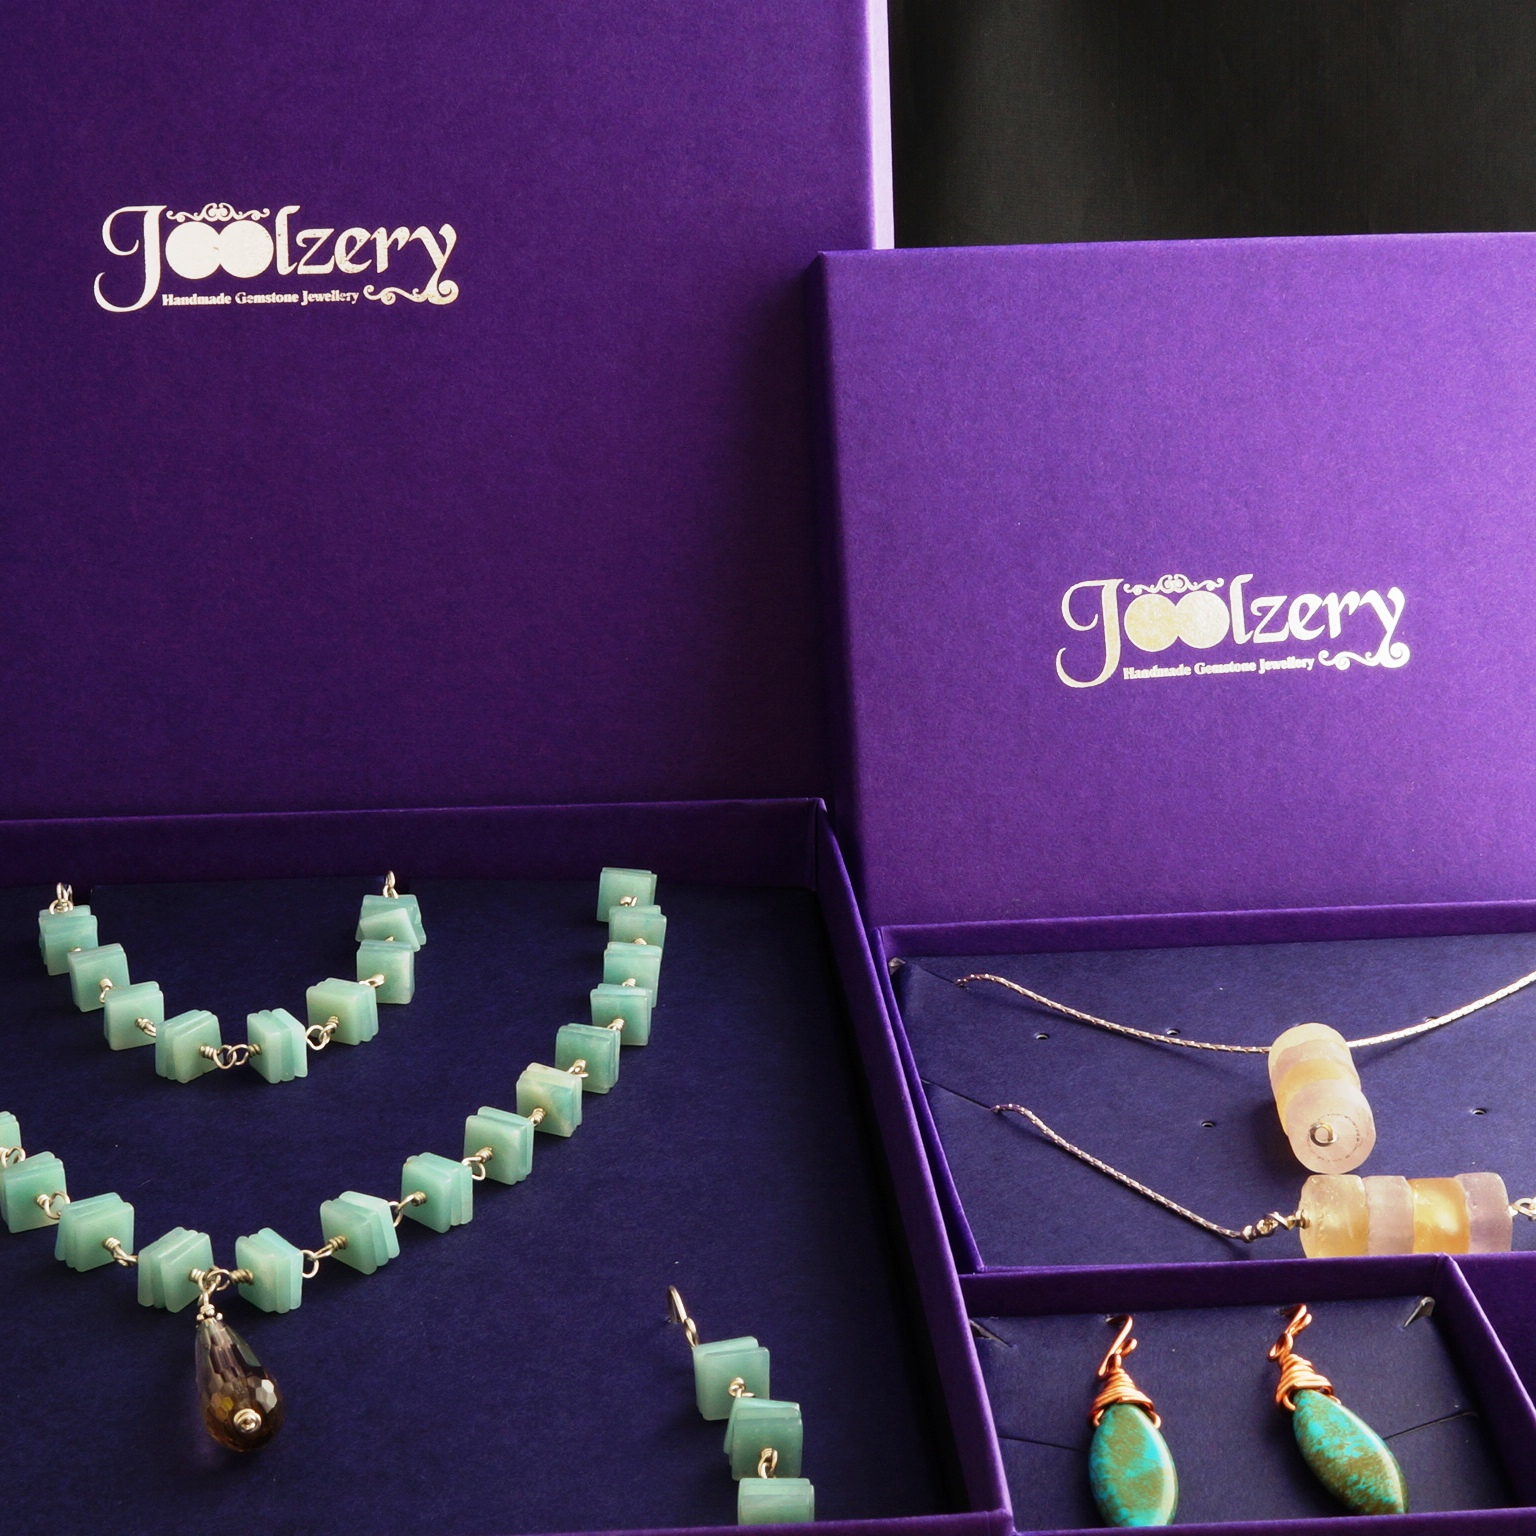 Joolzery New Jewellery Boxes with Jewellery